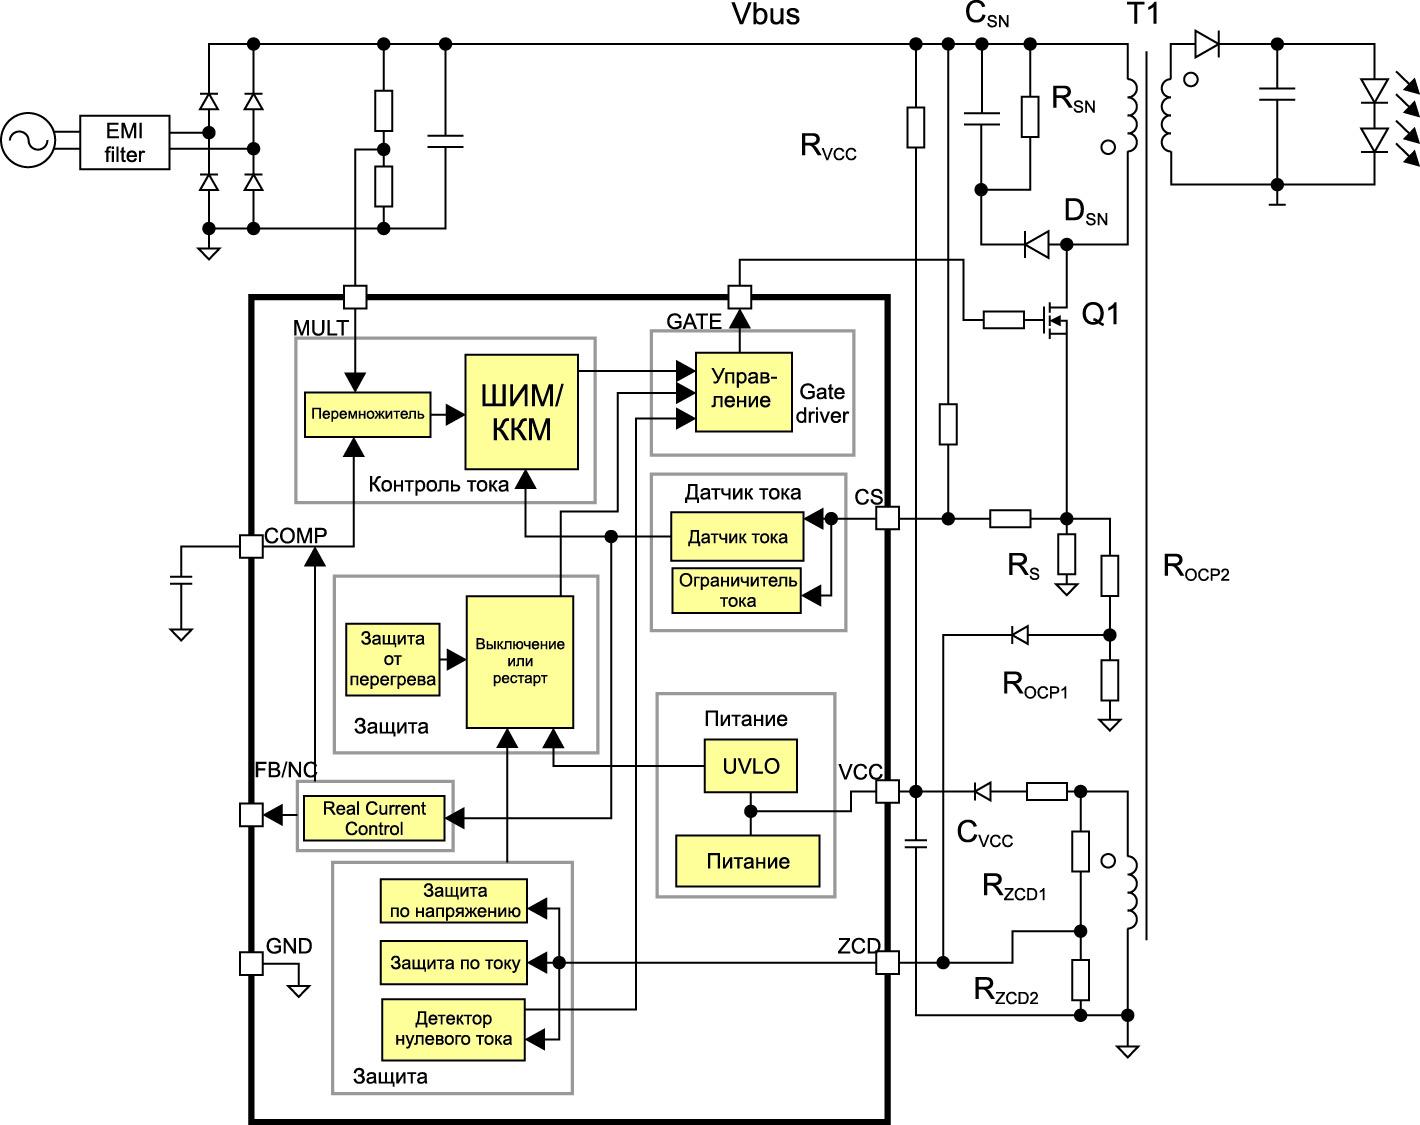 Блок-схема подключения драйвера на базе MP4021A